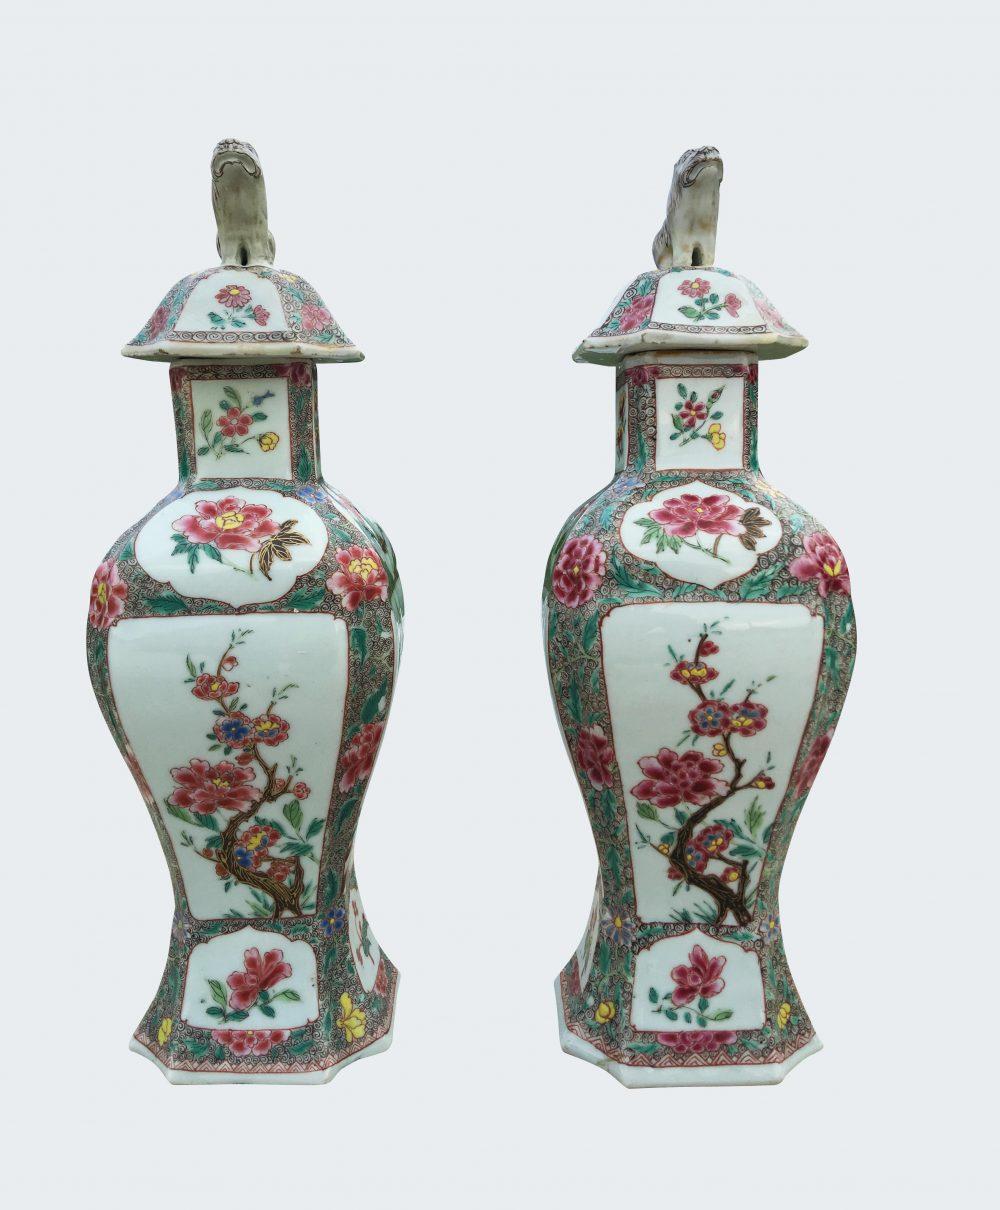 Famille rose Porcelaine Qianlong (1735-1795), vers 1730/1740, Chine